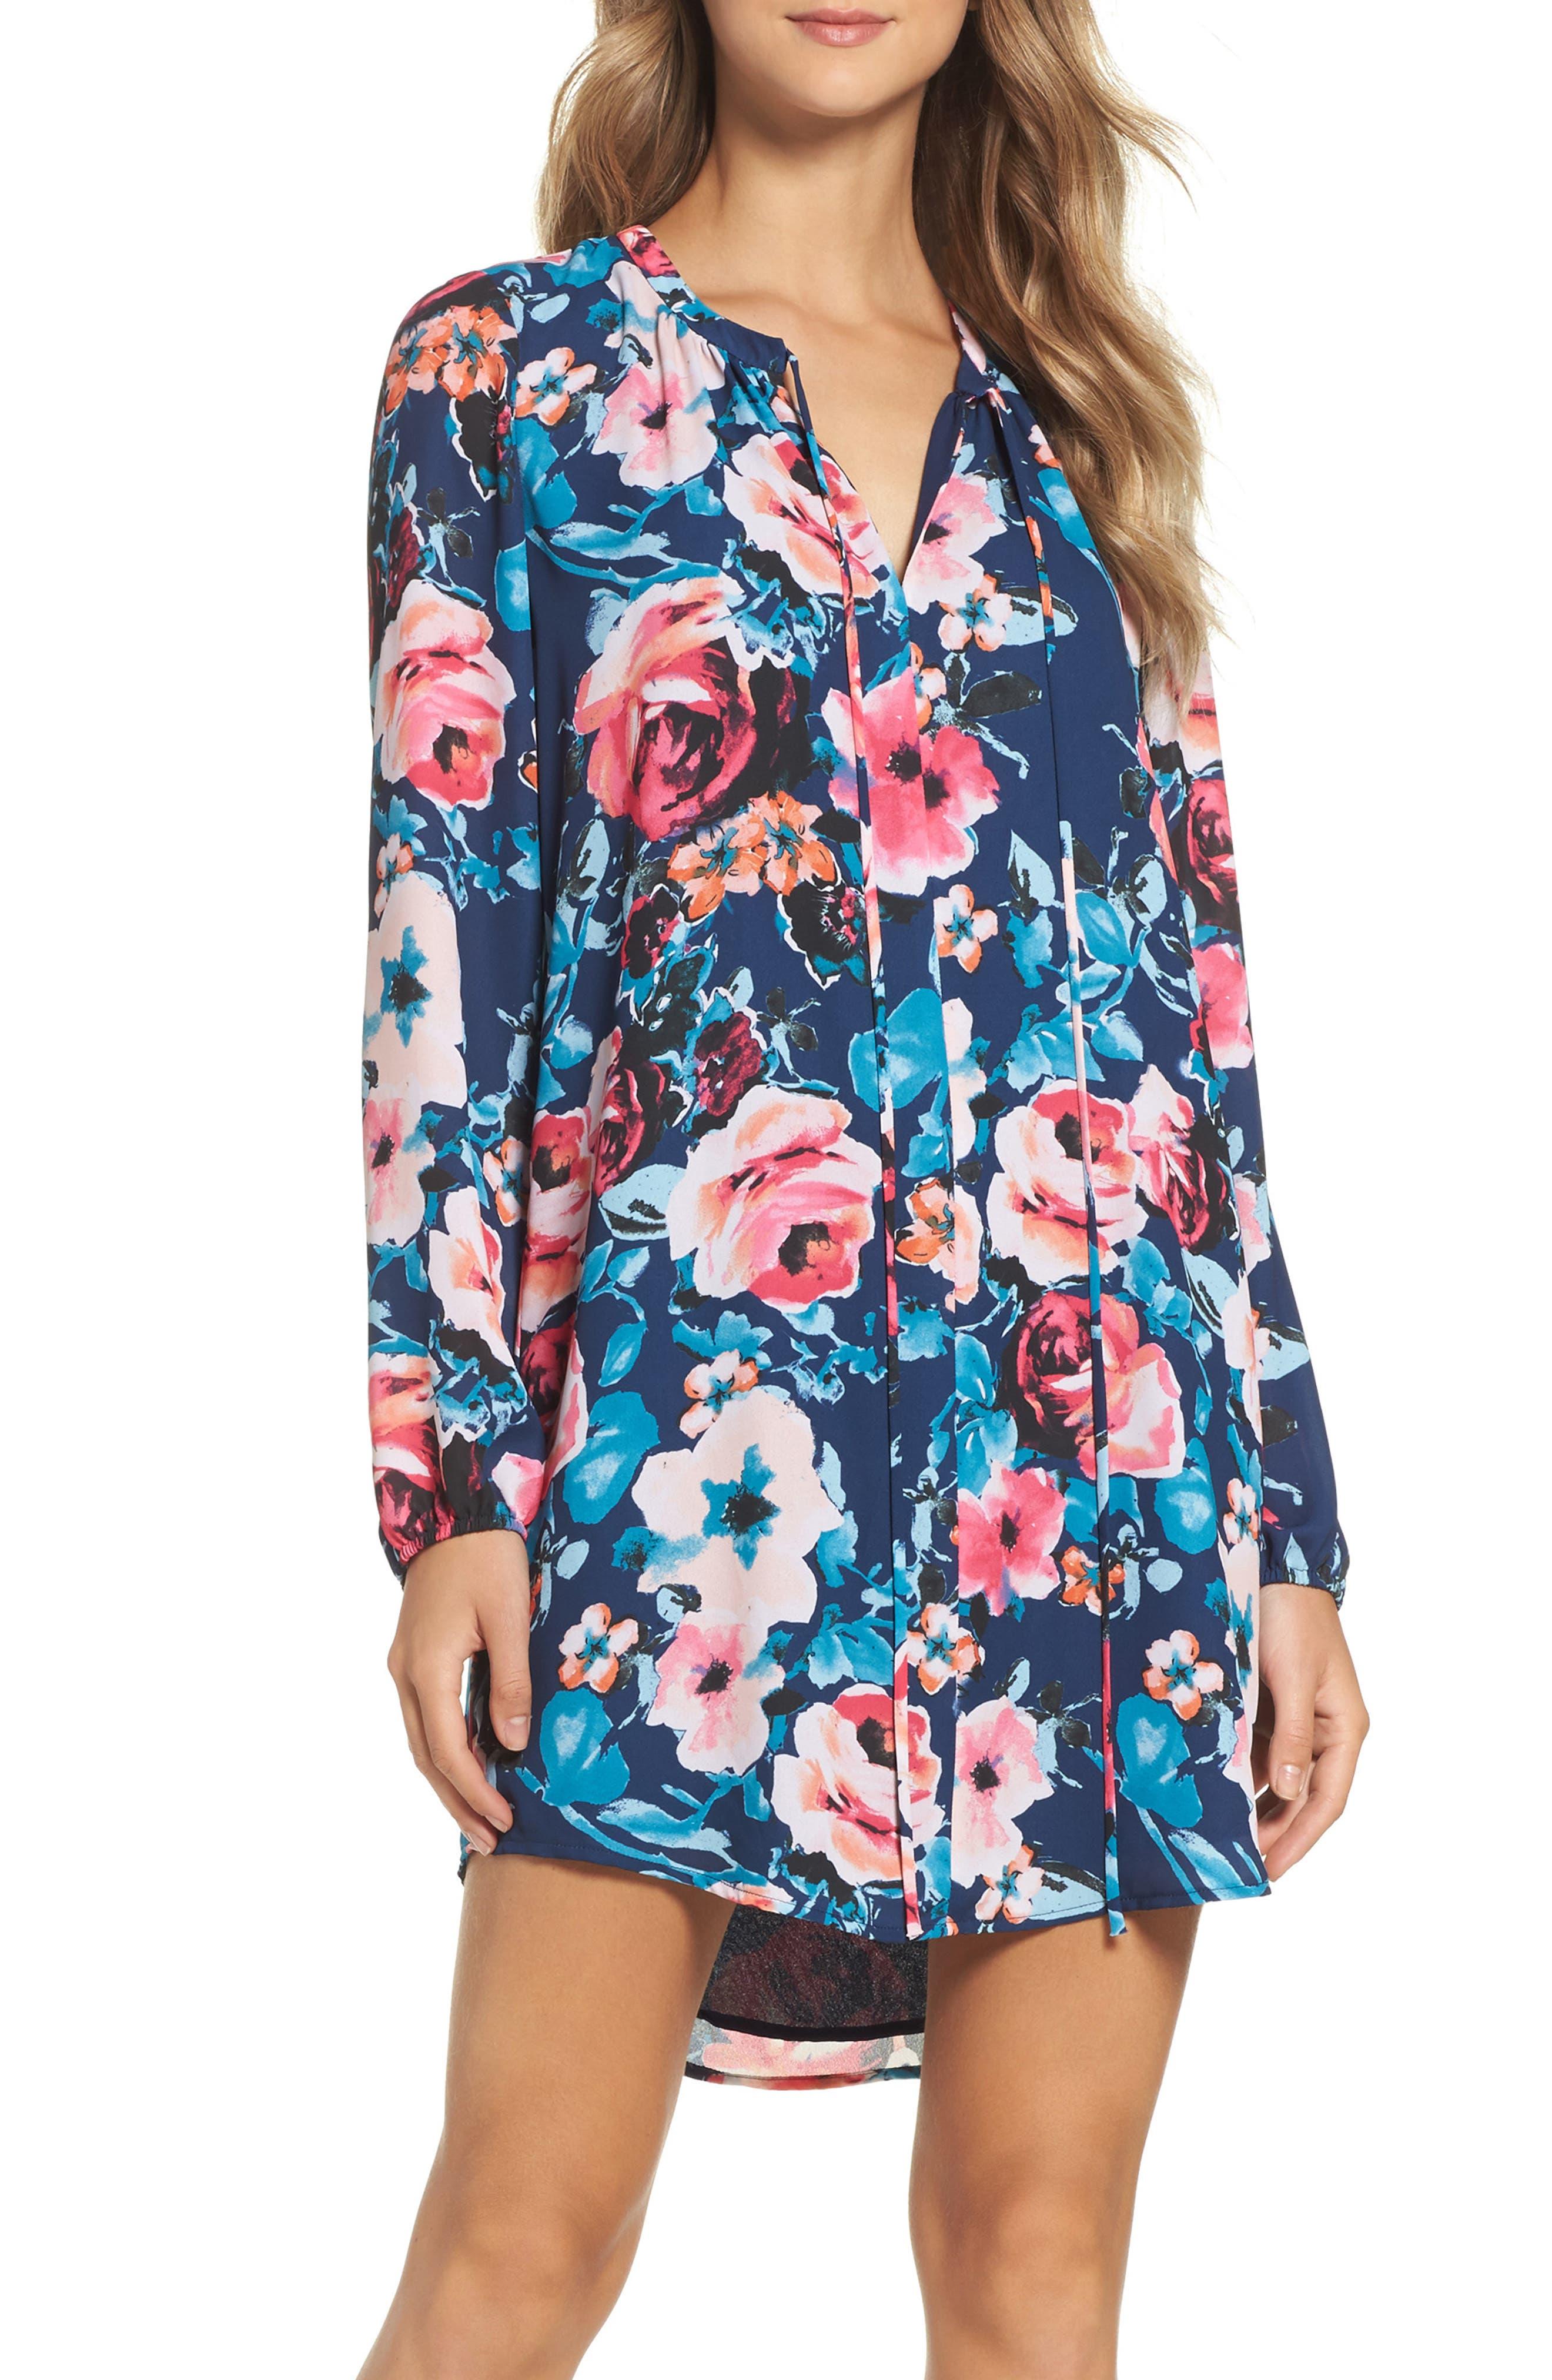 Alternate Image 1 Selected - Charles Henry Floral Shirtdress (Regular & Petite)